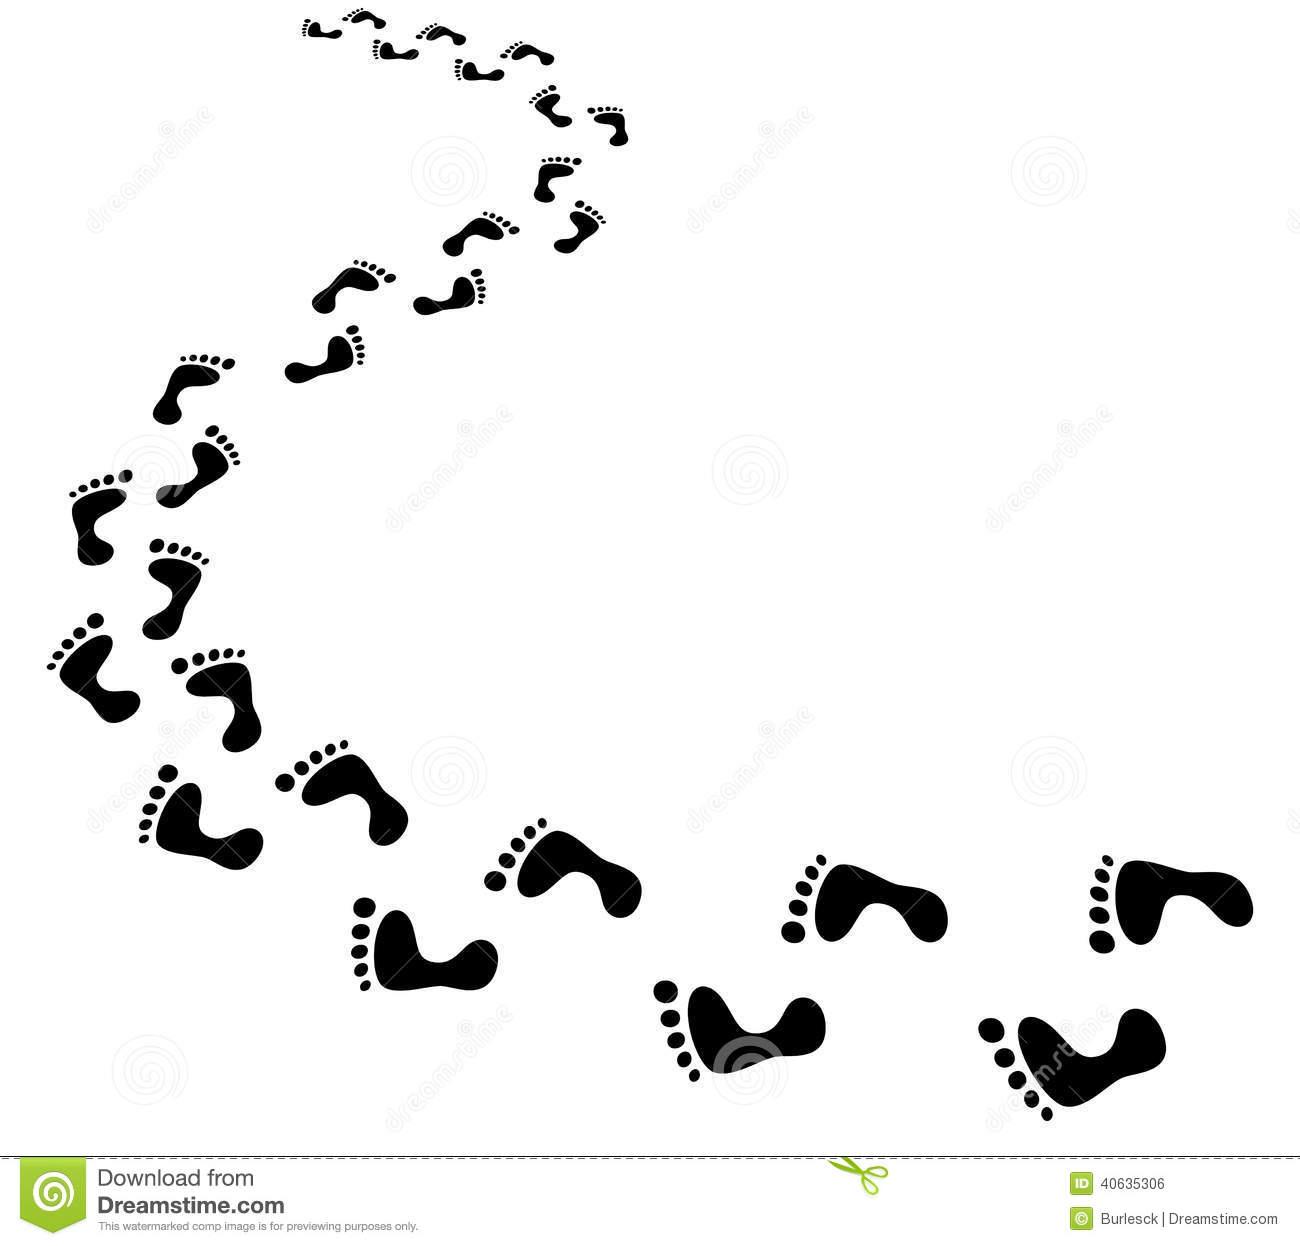 1639 Footprints free clipart.